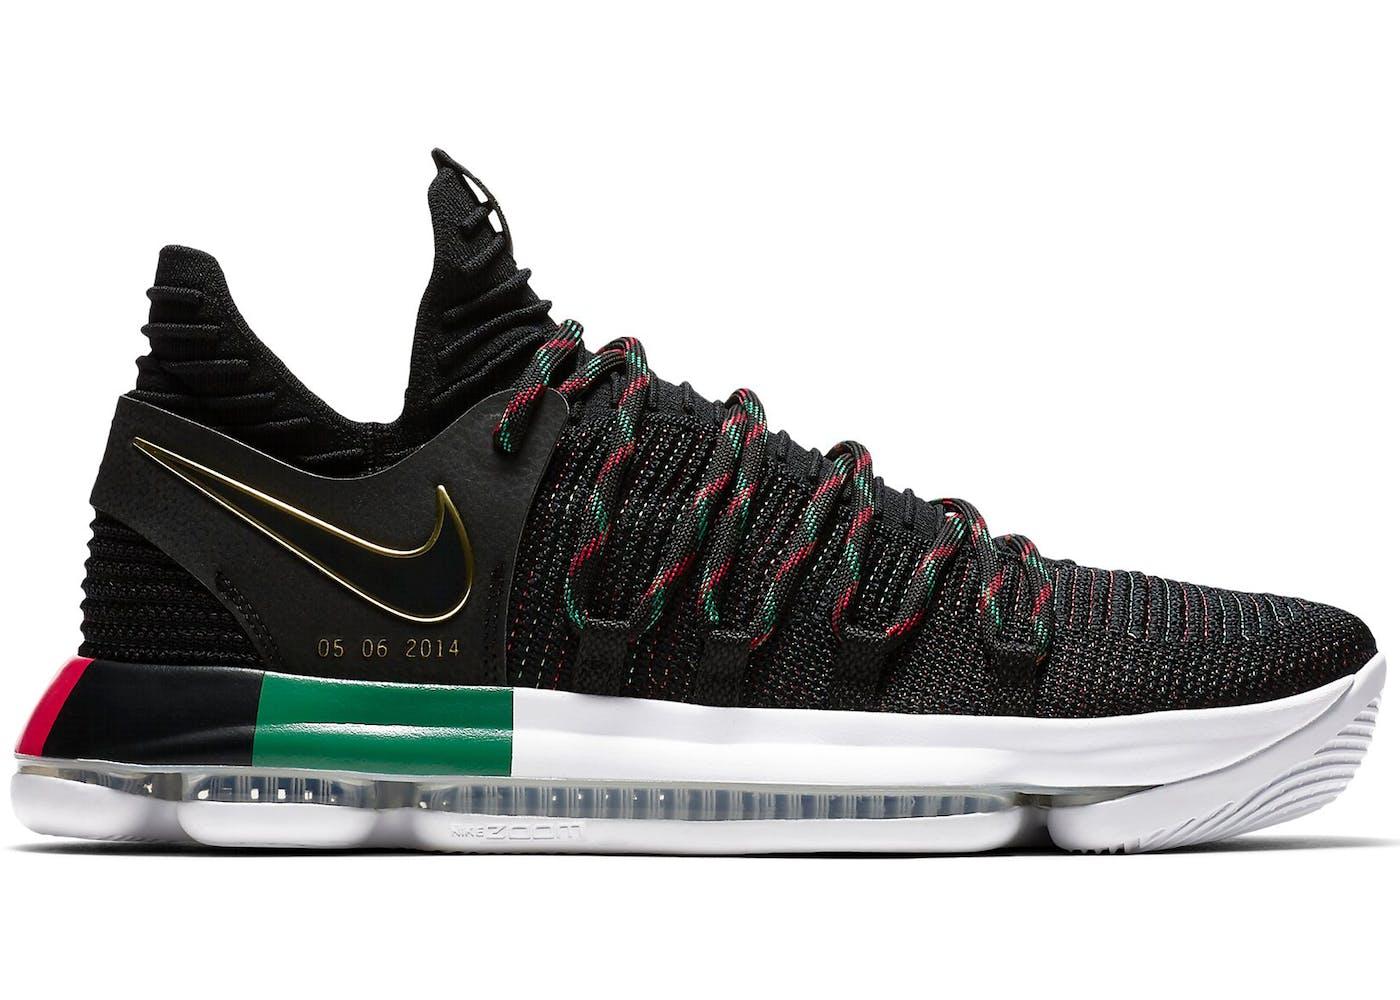 Nike Vapormax Black History Month